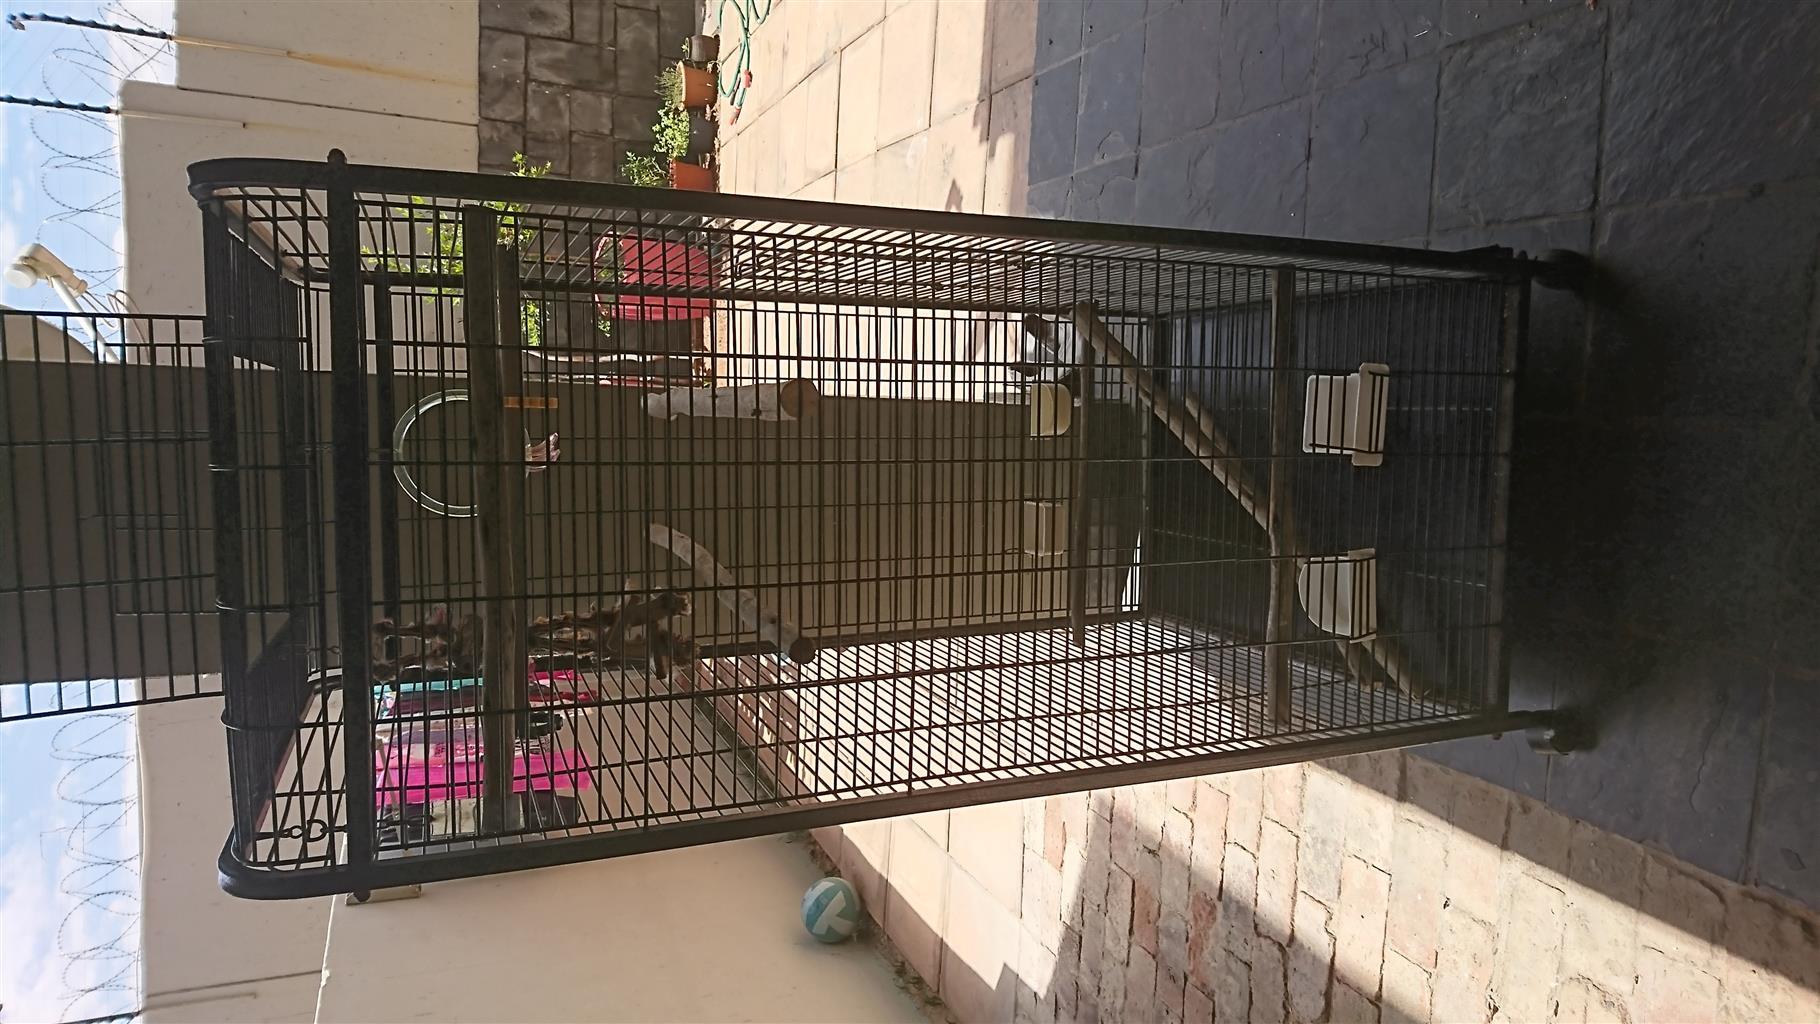 1 x large bird cage